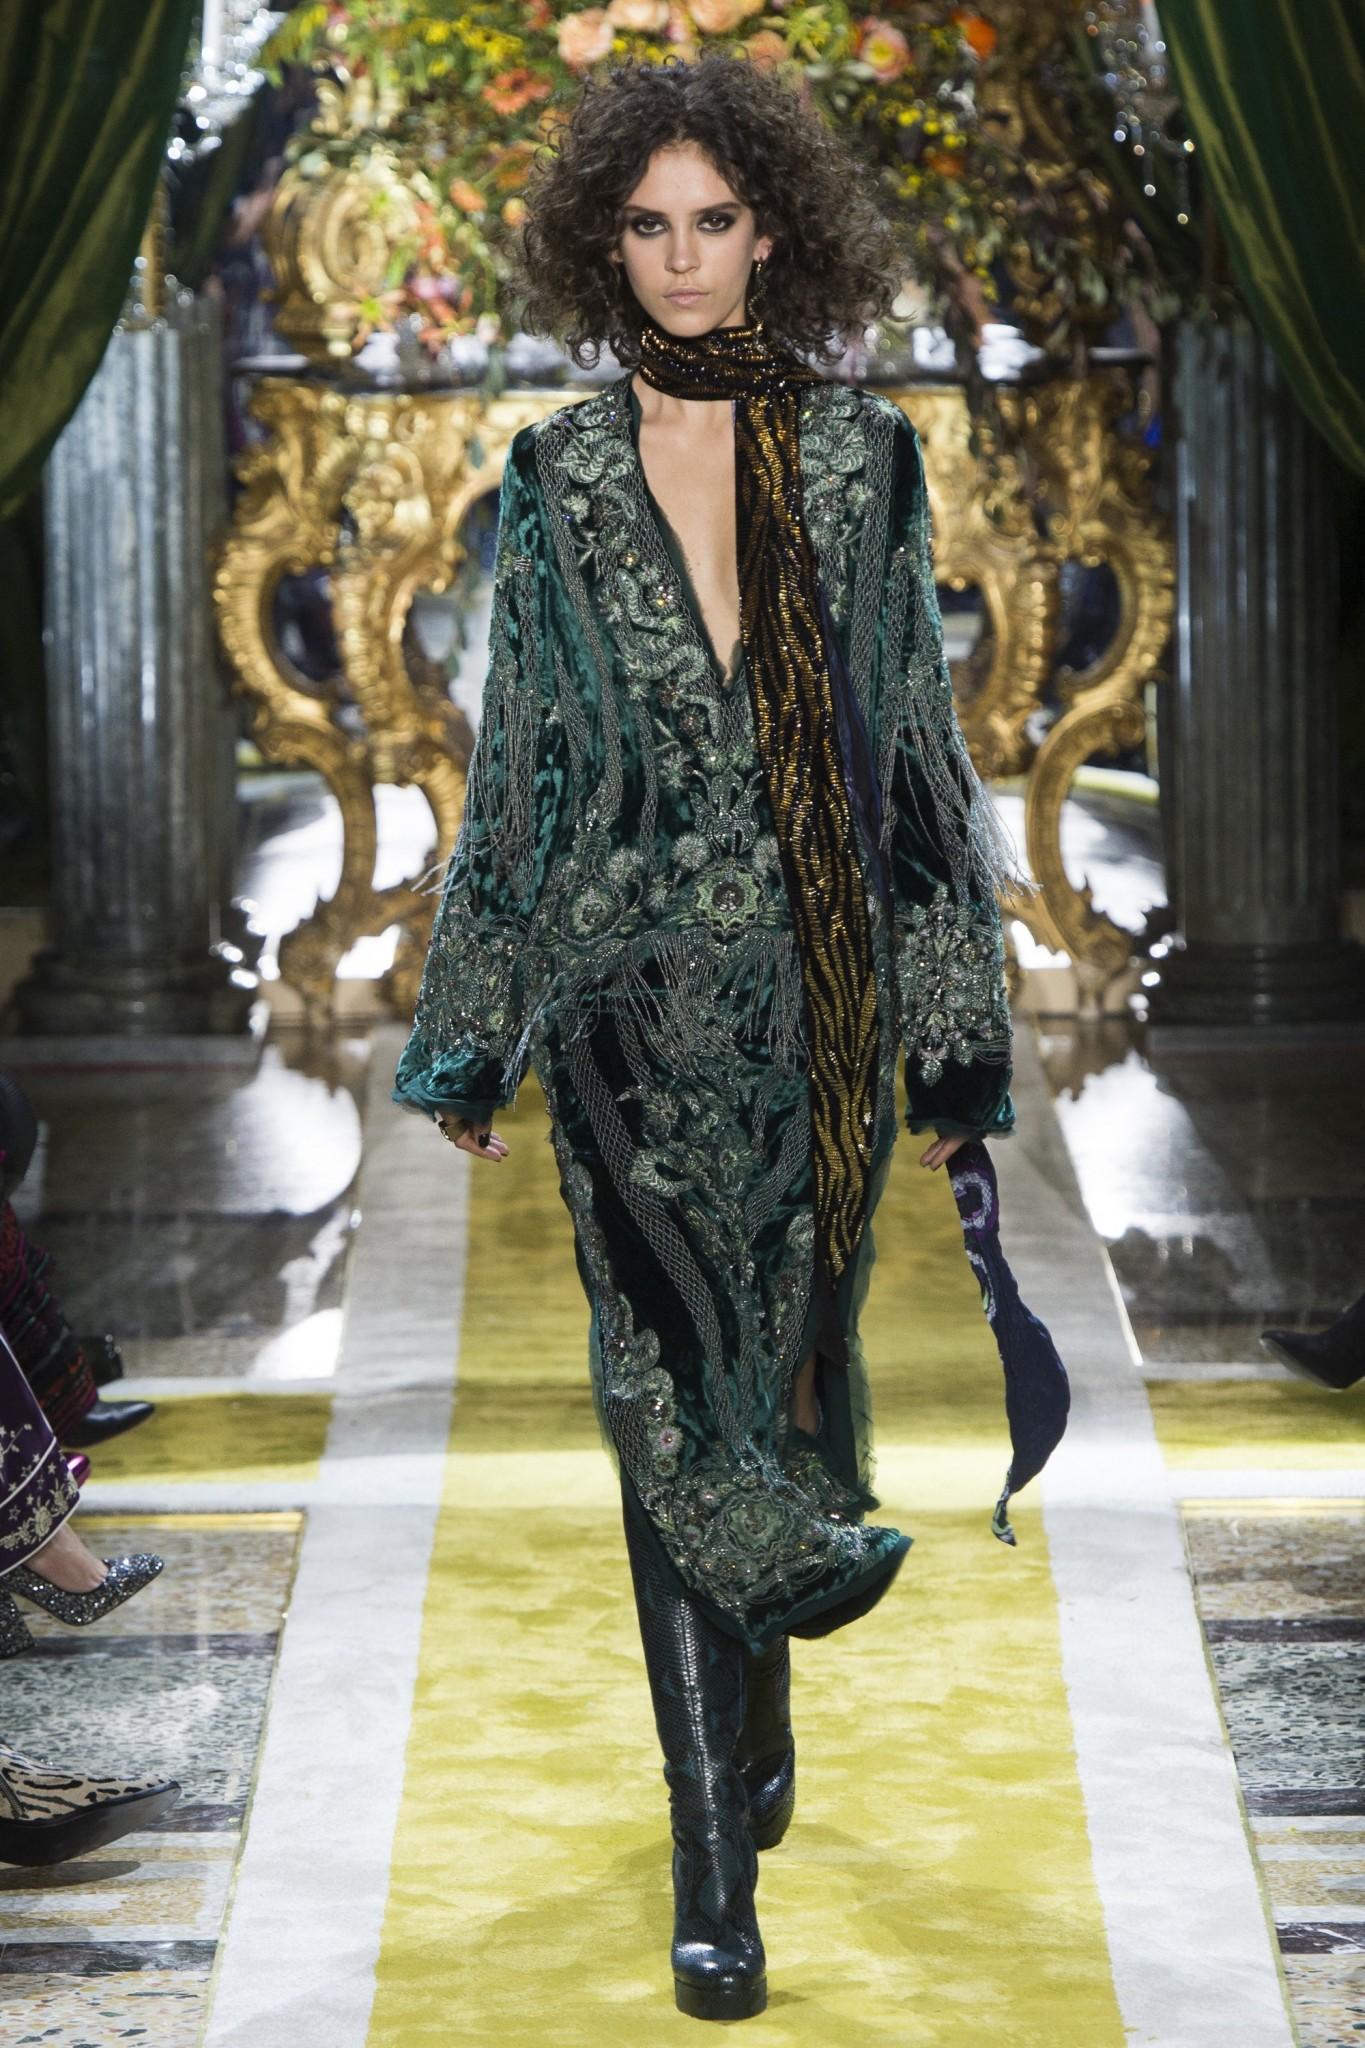 fabulous_the_boho_maxi_dress_roberto_cavalli_fw2016-2